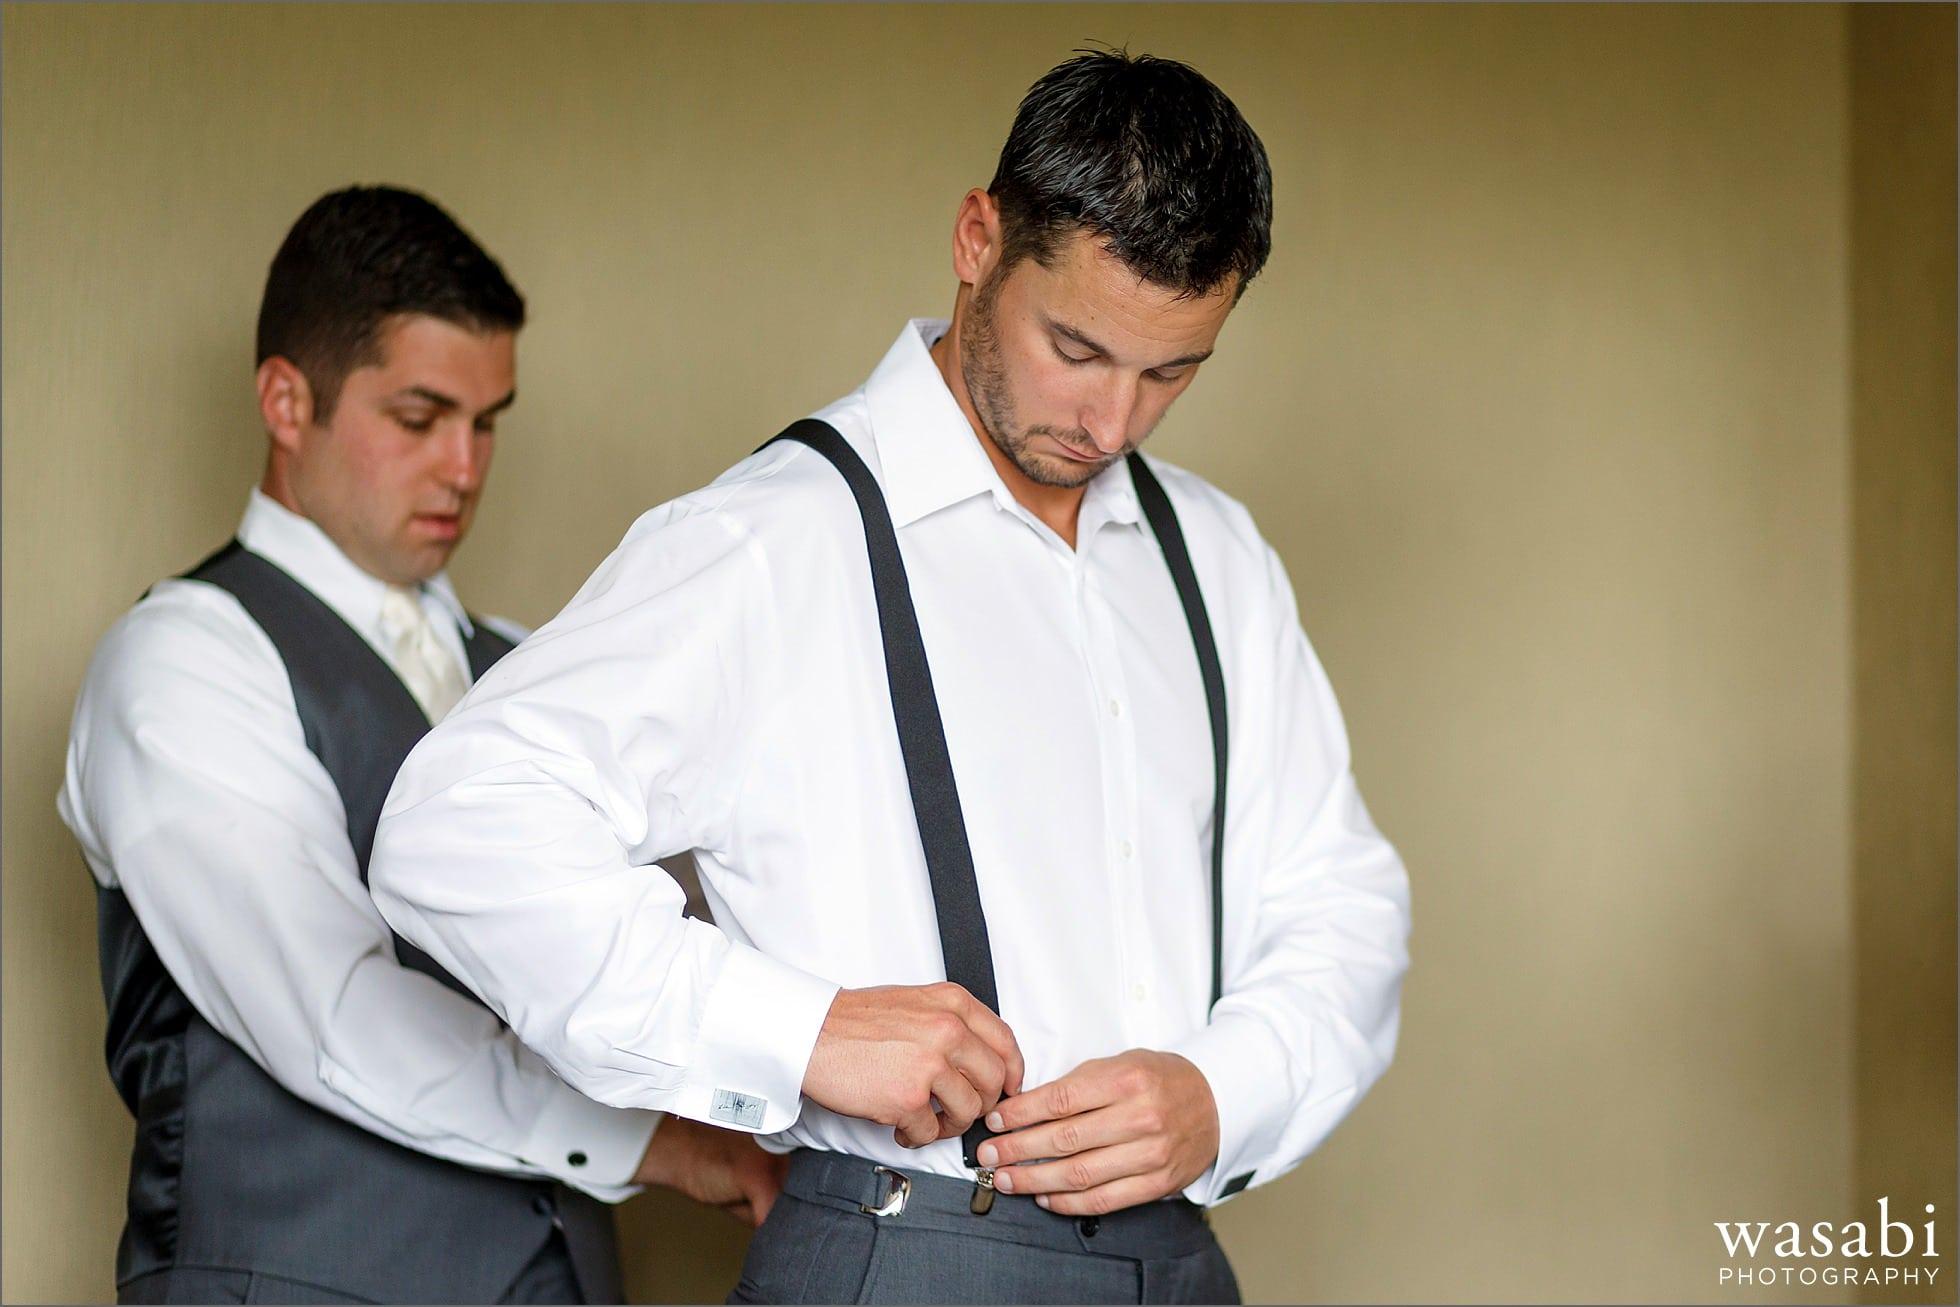 doubletree hilton hotel libertyville mundelein wedding getting ready